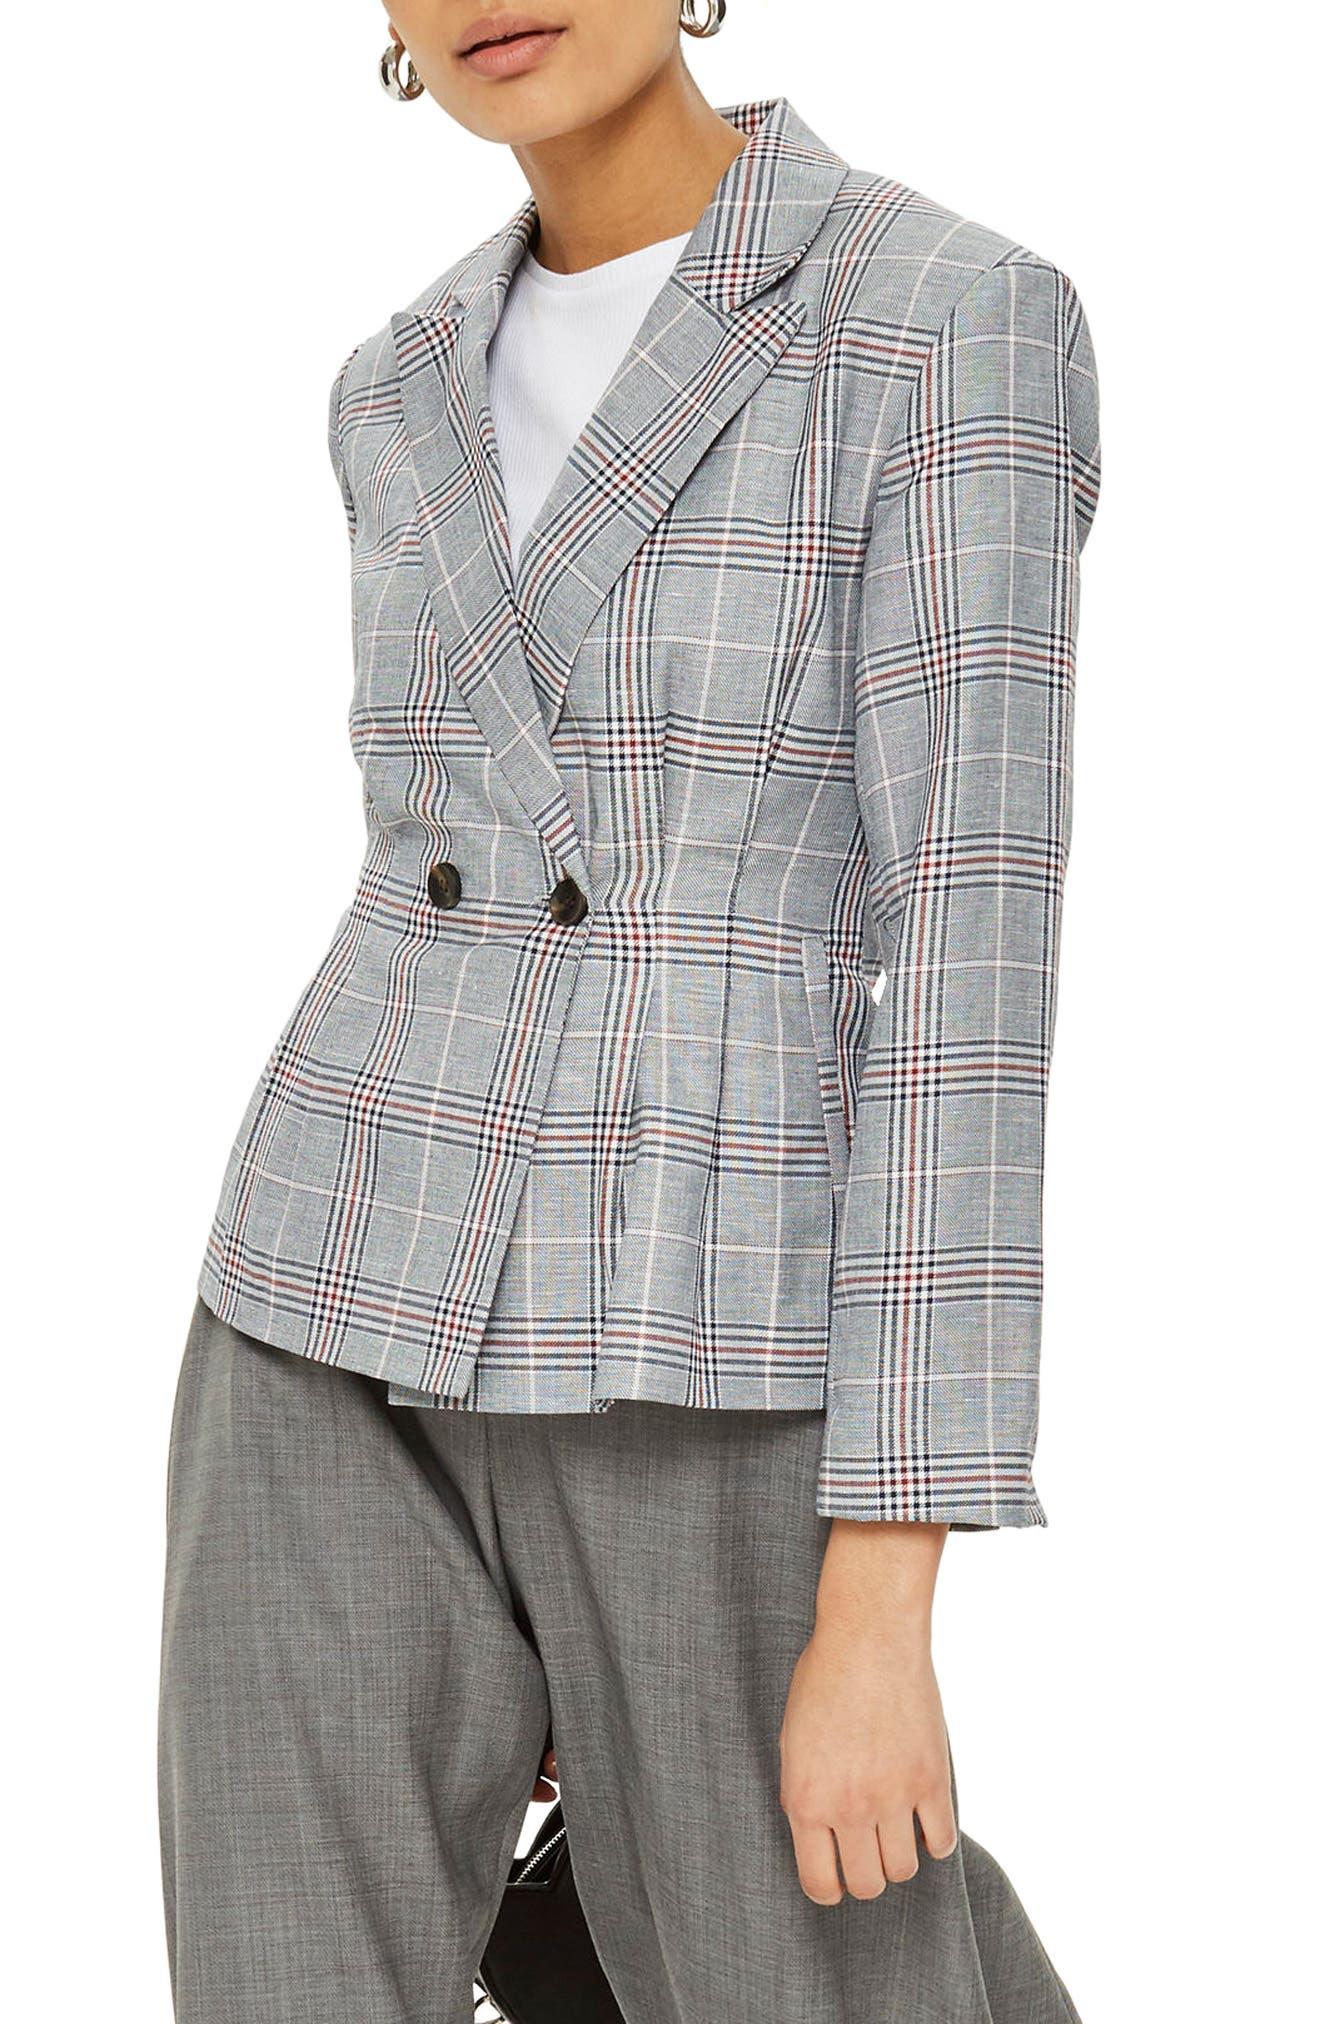 Cham Linen Checkered Jacket,                             Main thumbnail 1, color,                             021